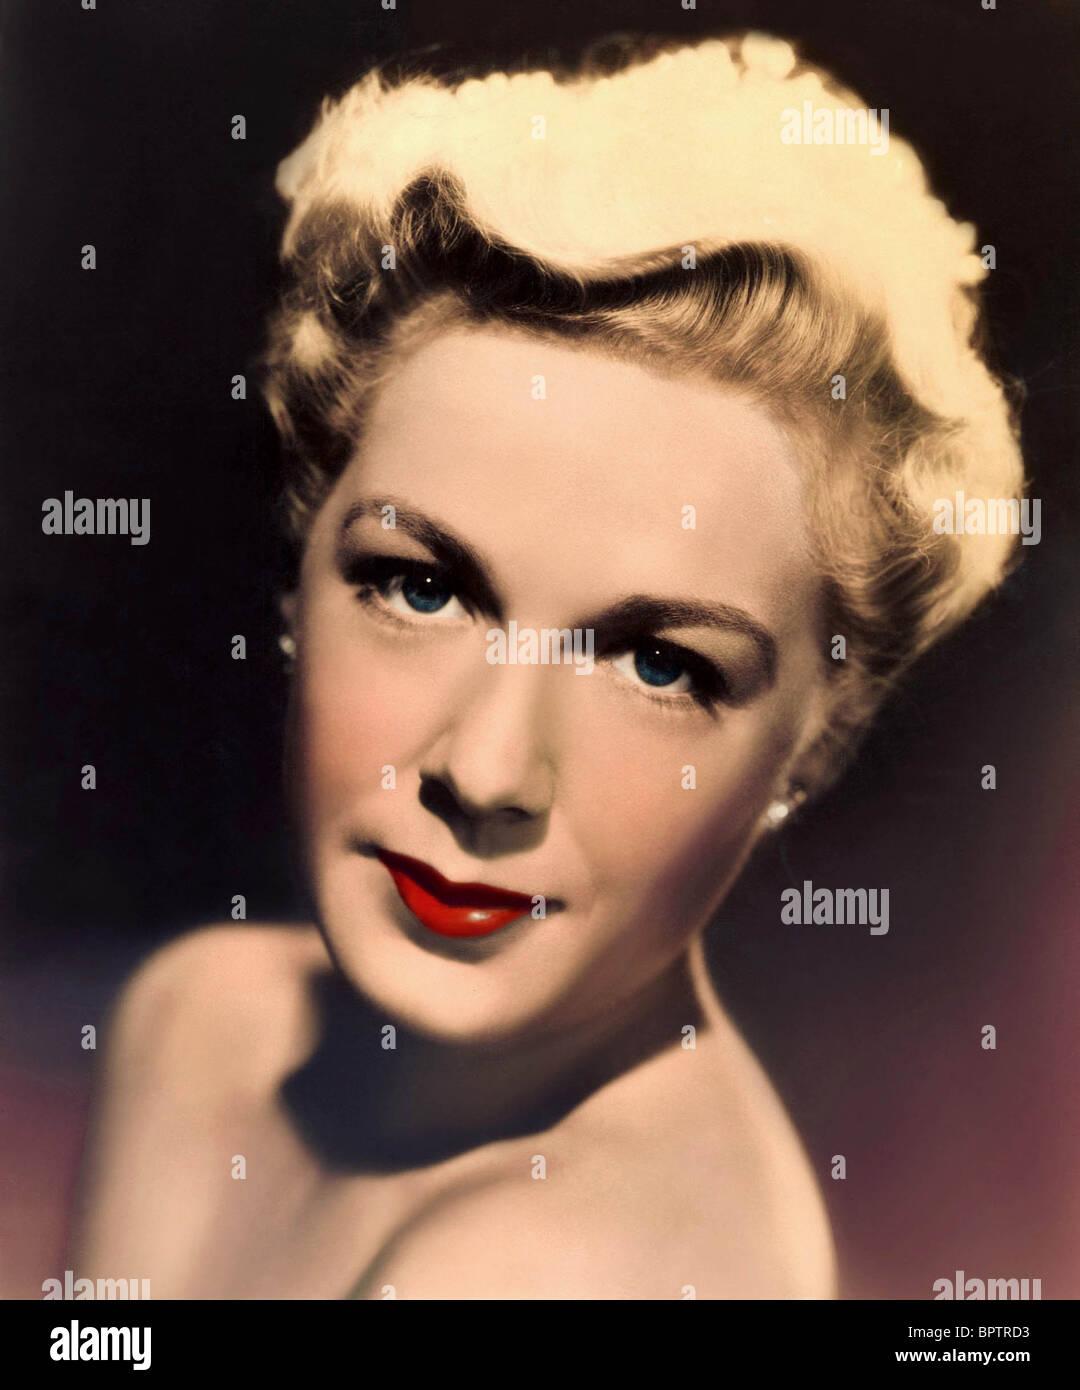 BETTY HUTTON ACTRESS (1957) - Stock Image